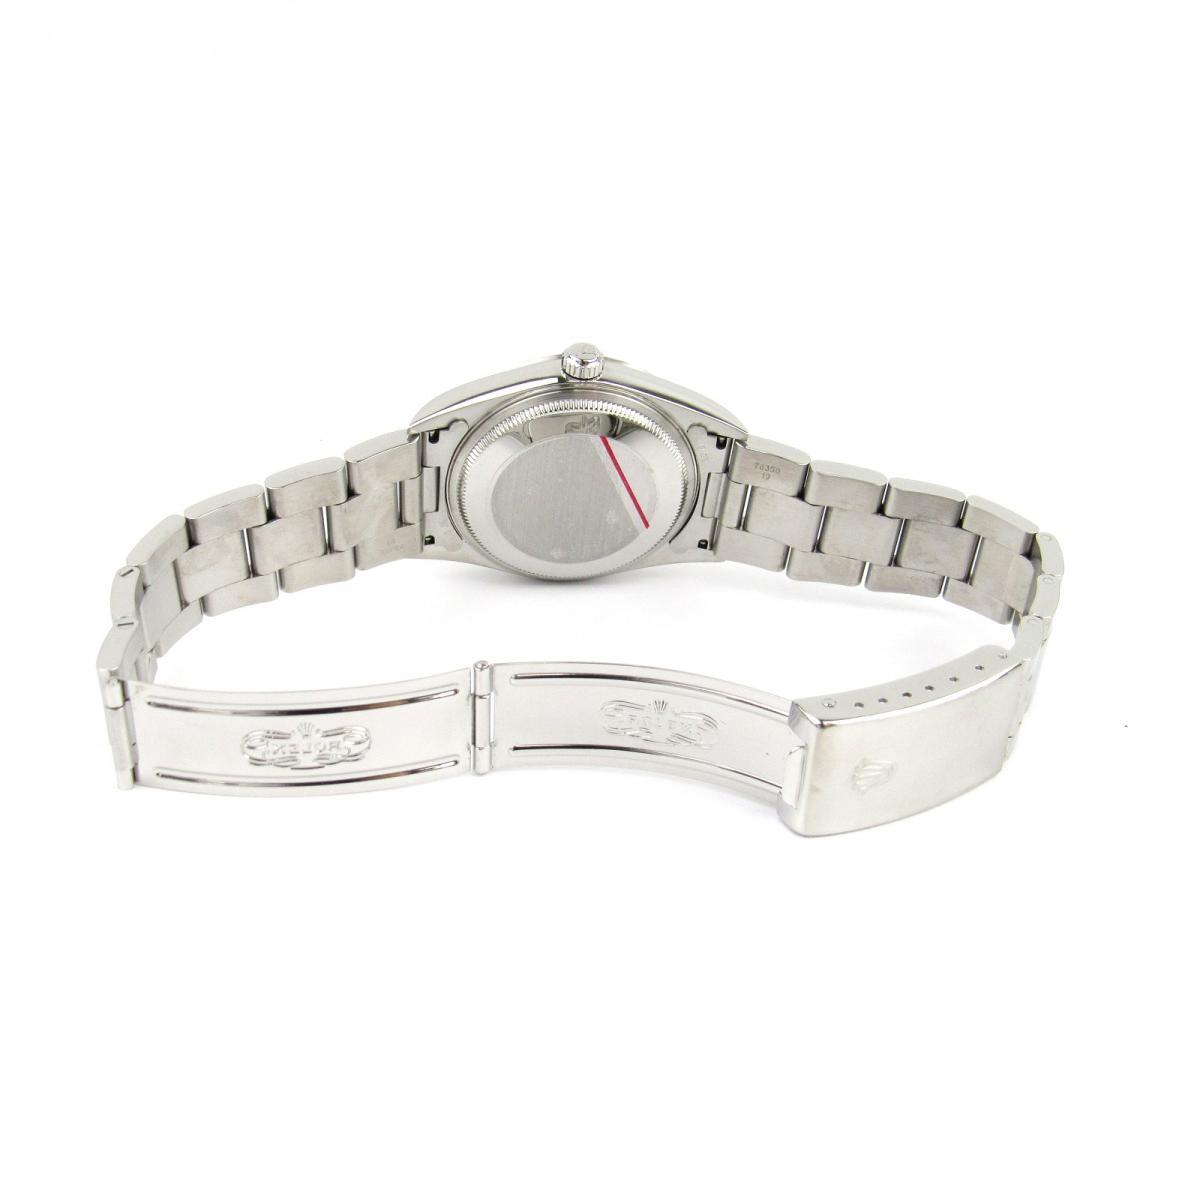 ROLEX 時計 14000M Y番 エアキング 腕時計 ウォッチ /おすすめ